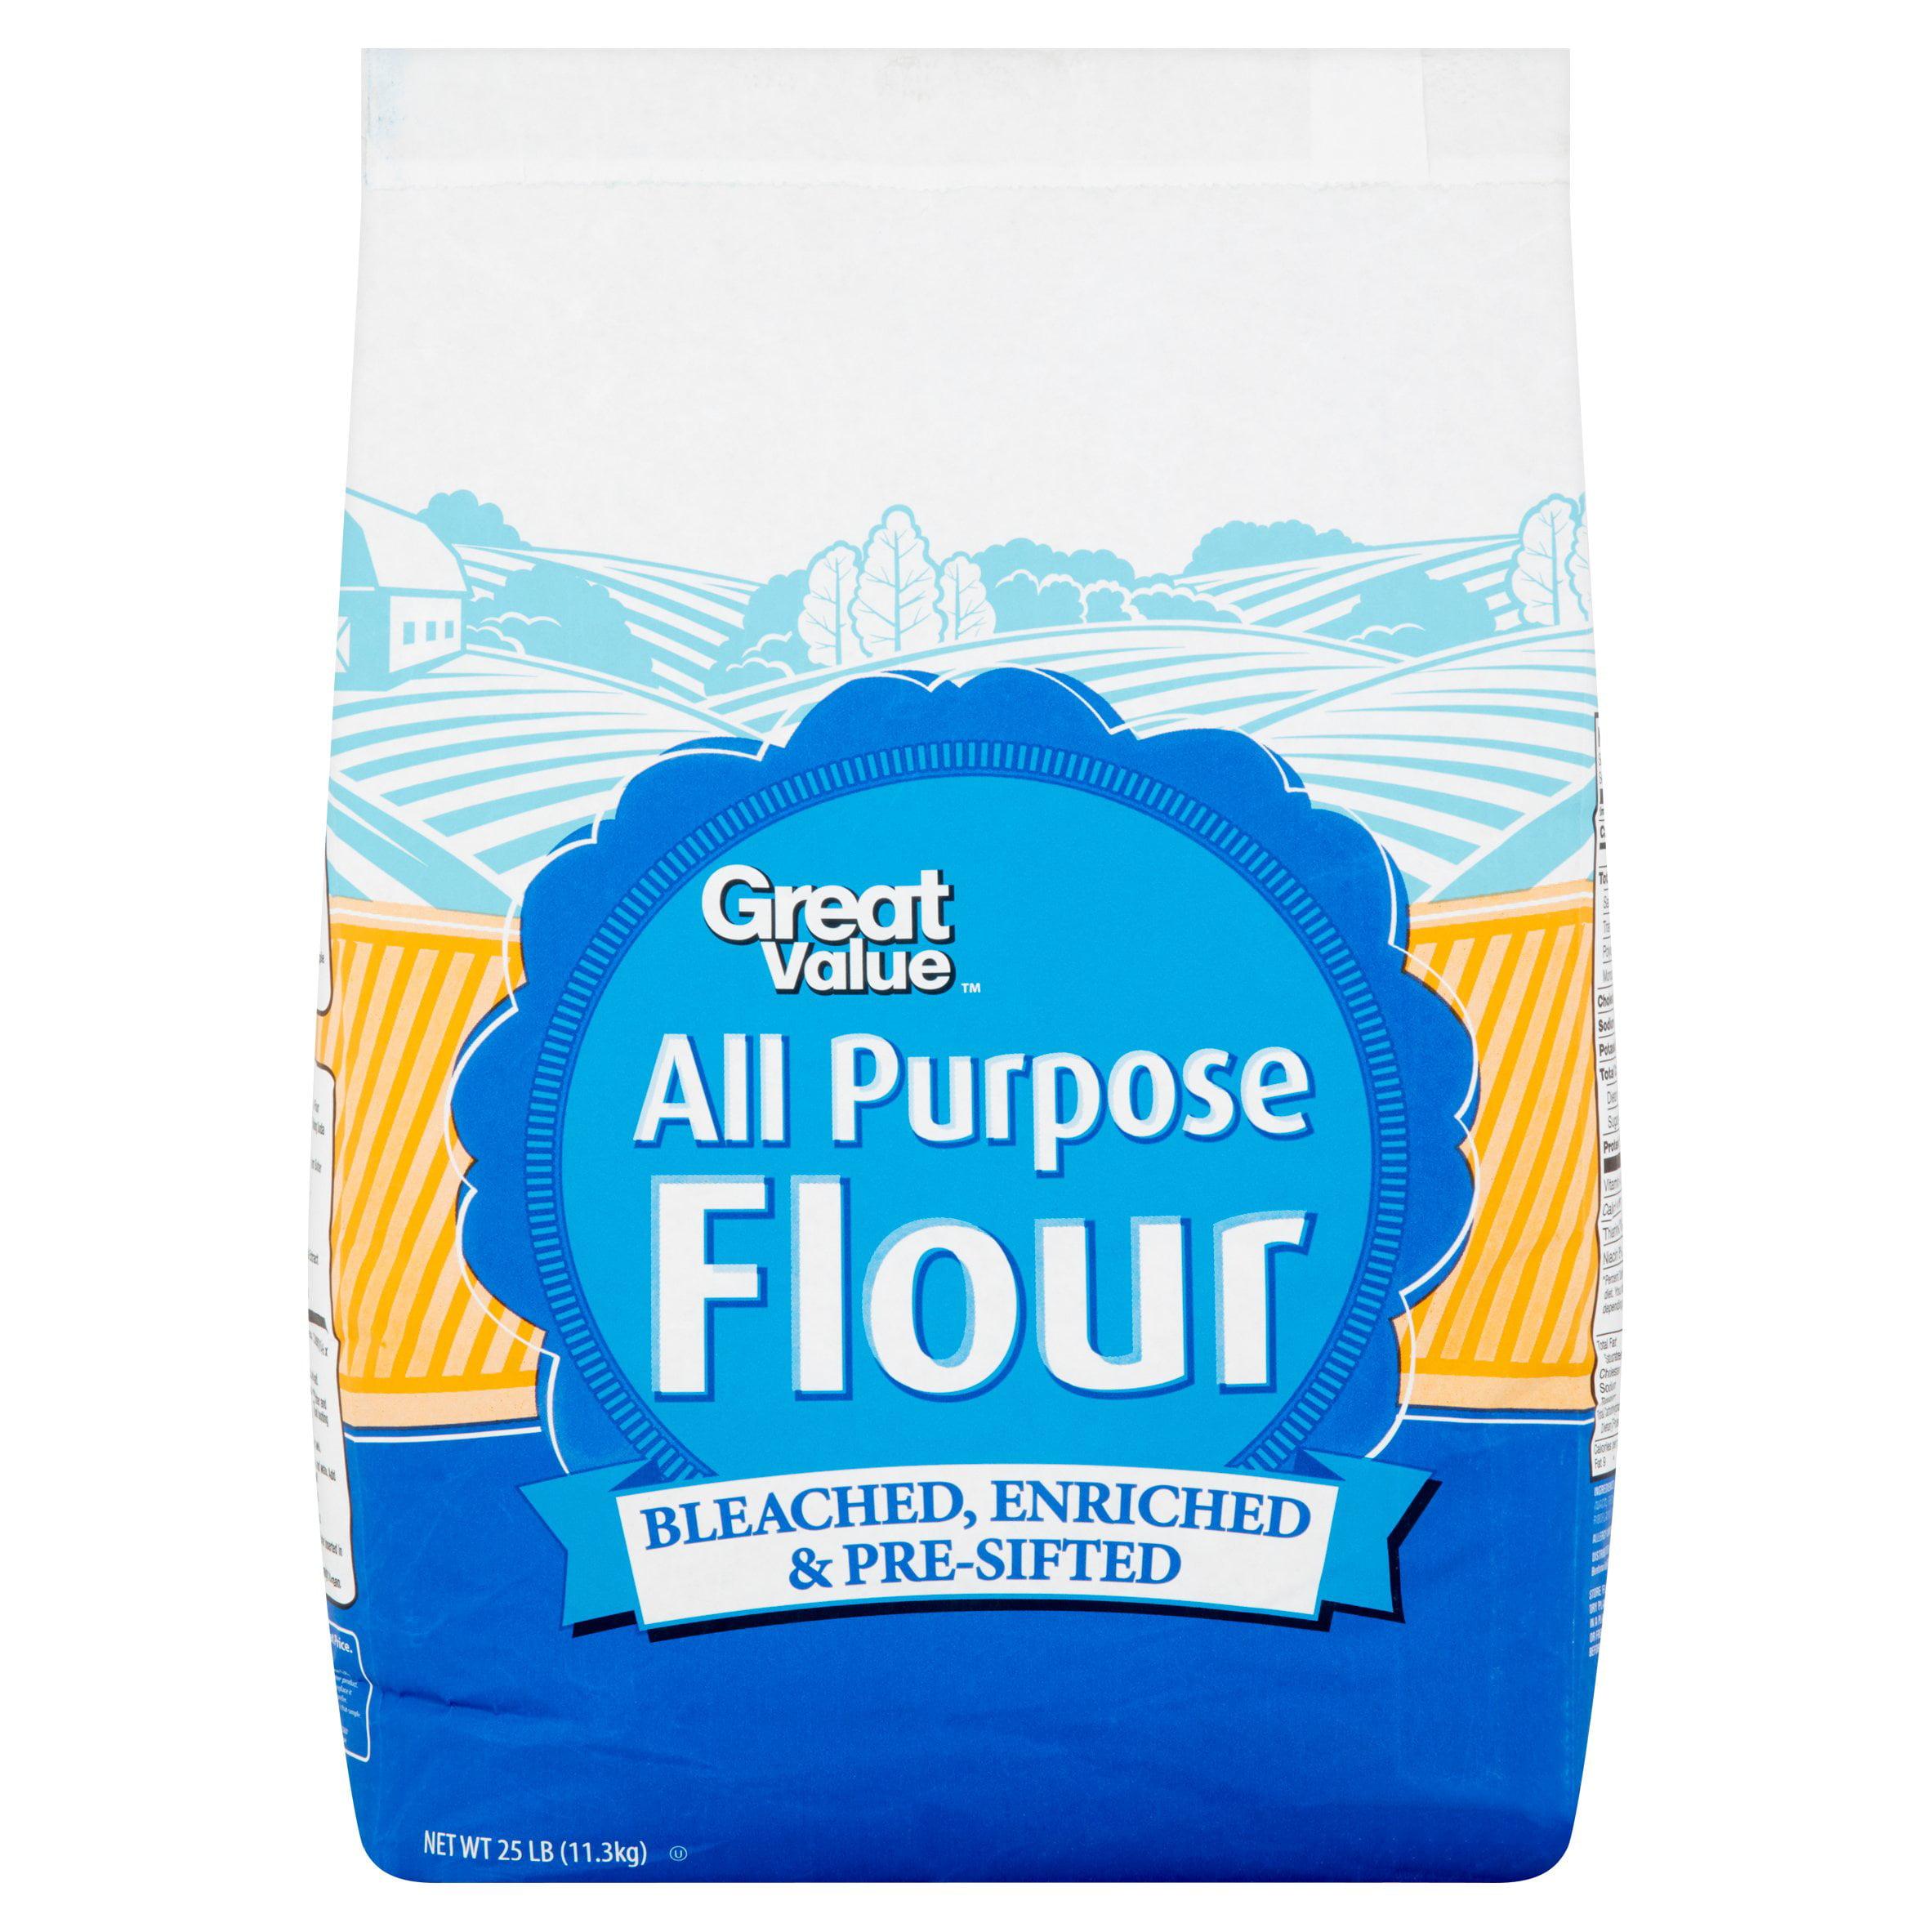 Great Value All Purpose Flour 25 lb